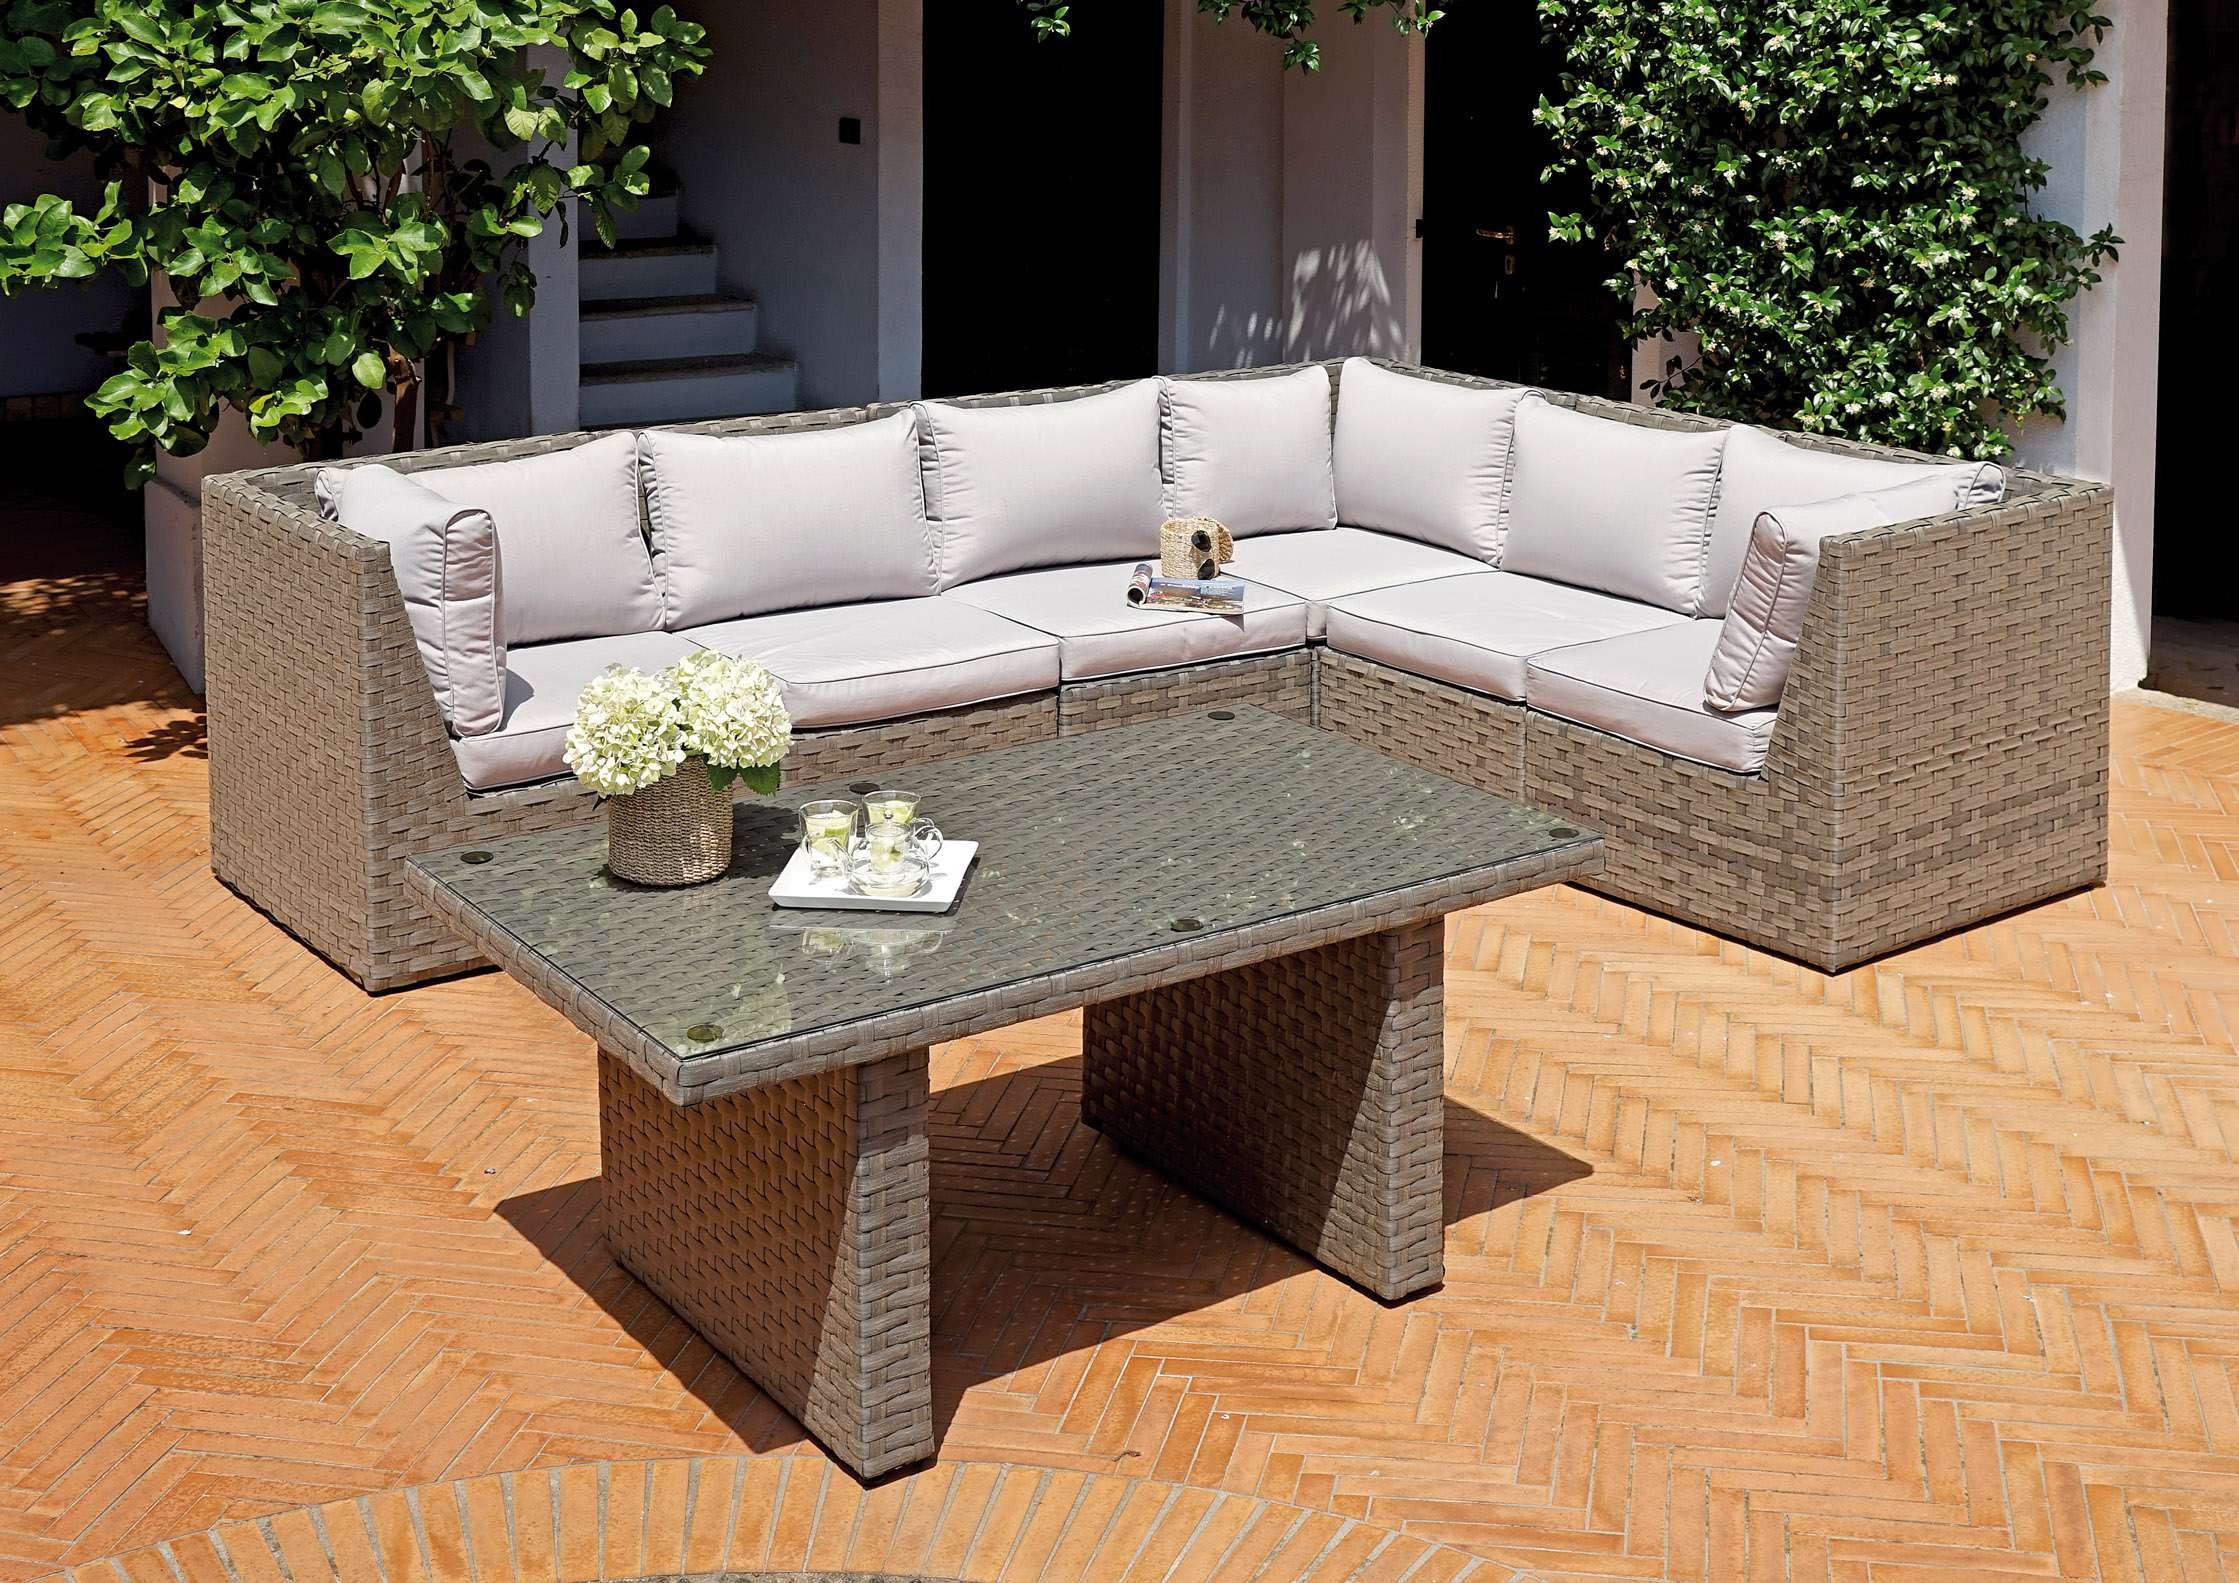 Set agrigento greenwood mobili da giardino for Ambientazioni salotti